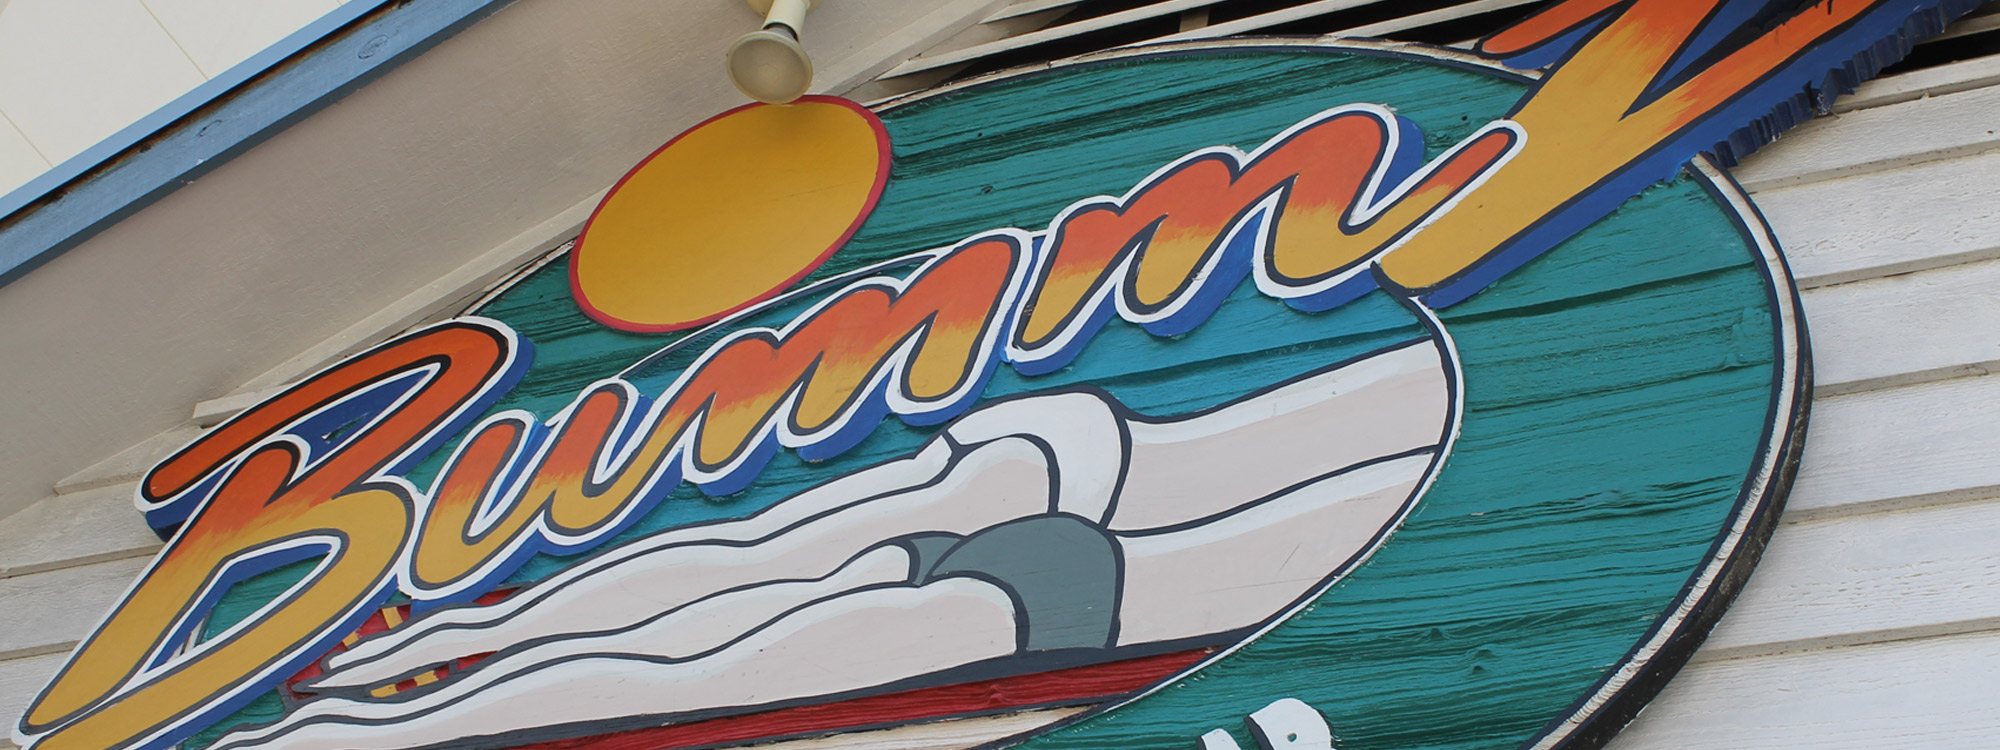 Bummz Beach Cafe